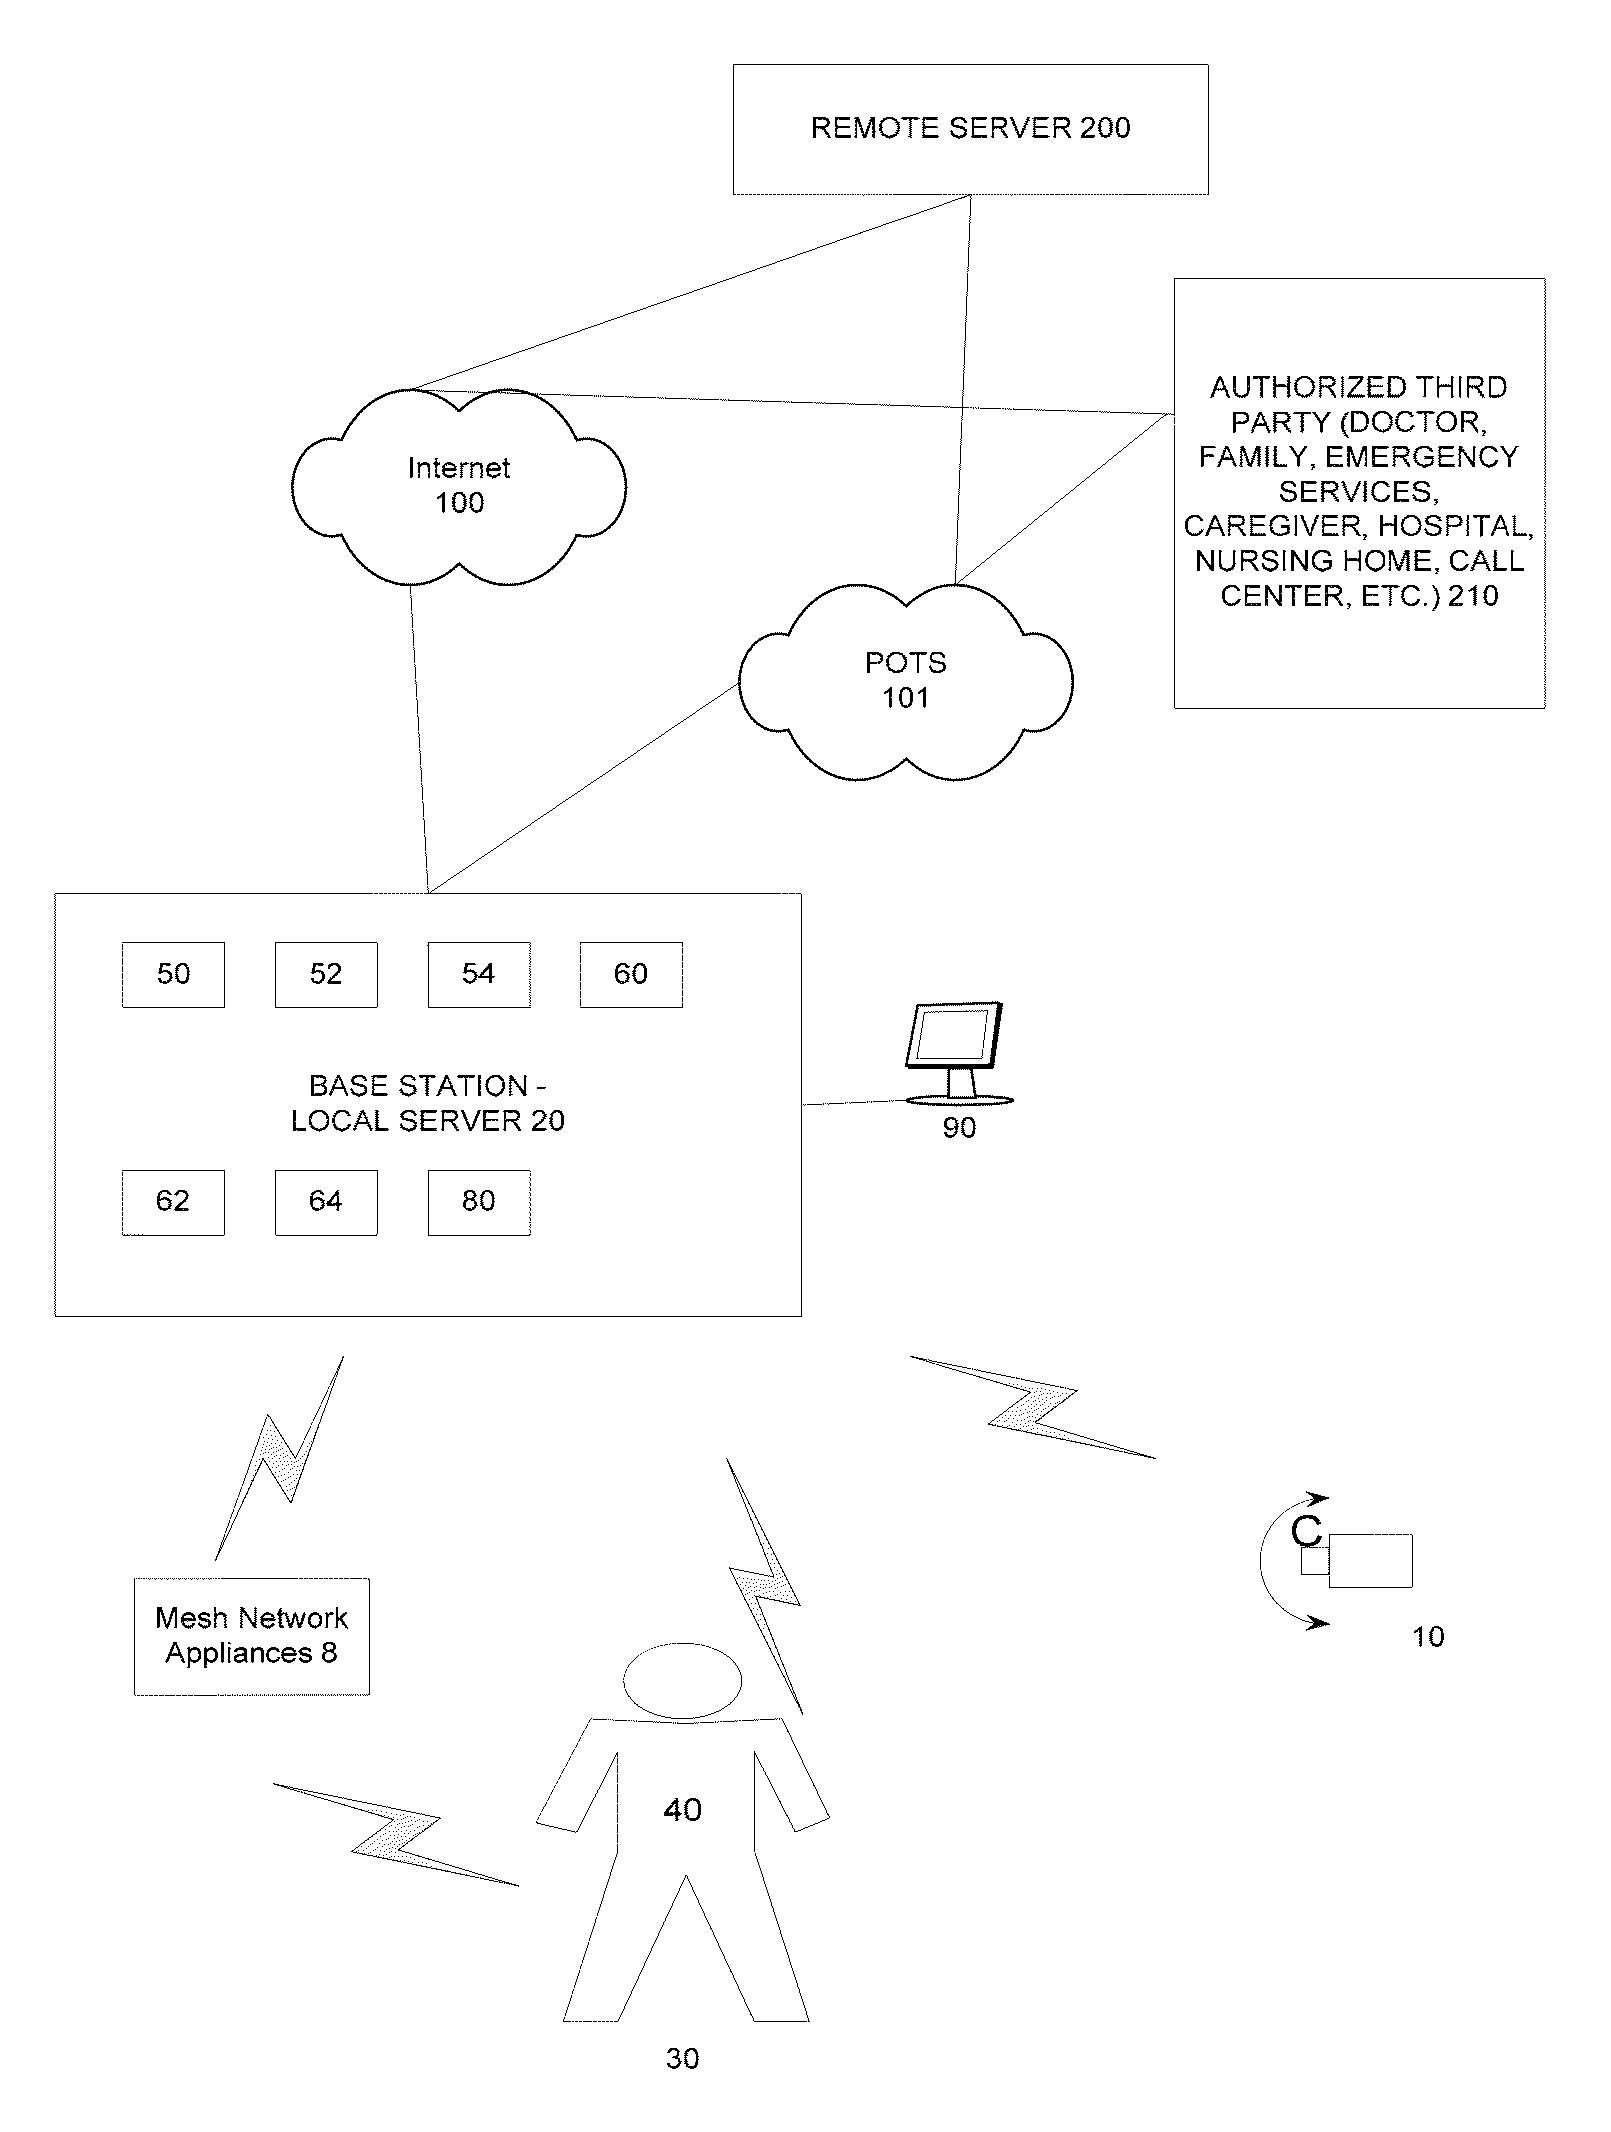 Patent US 8,727,978 B2